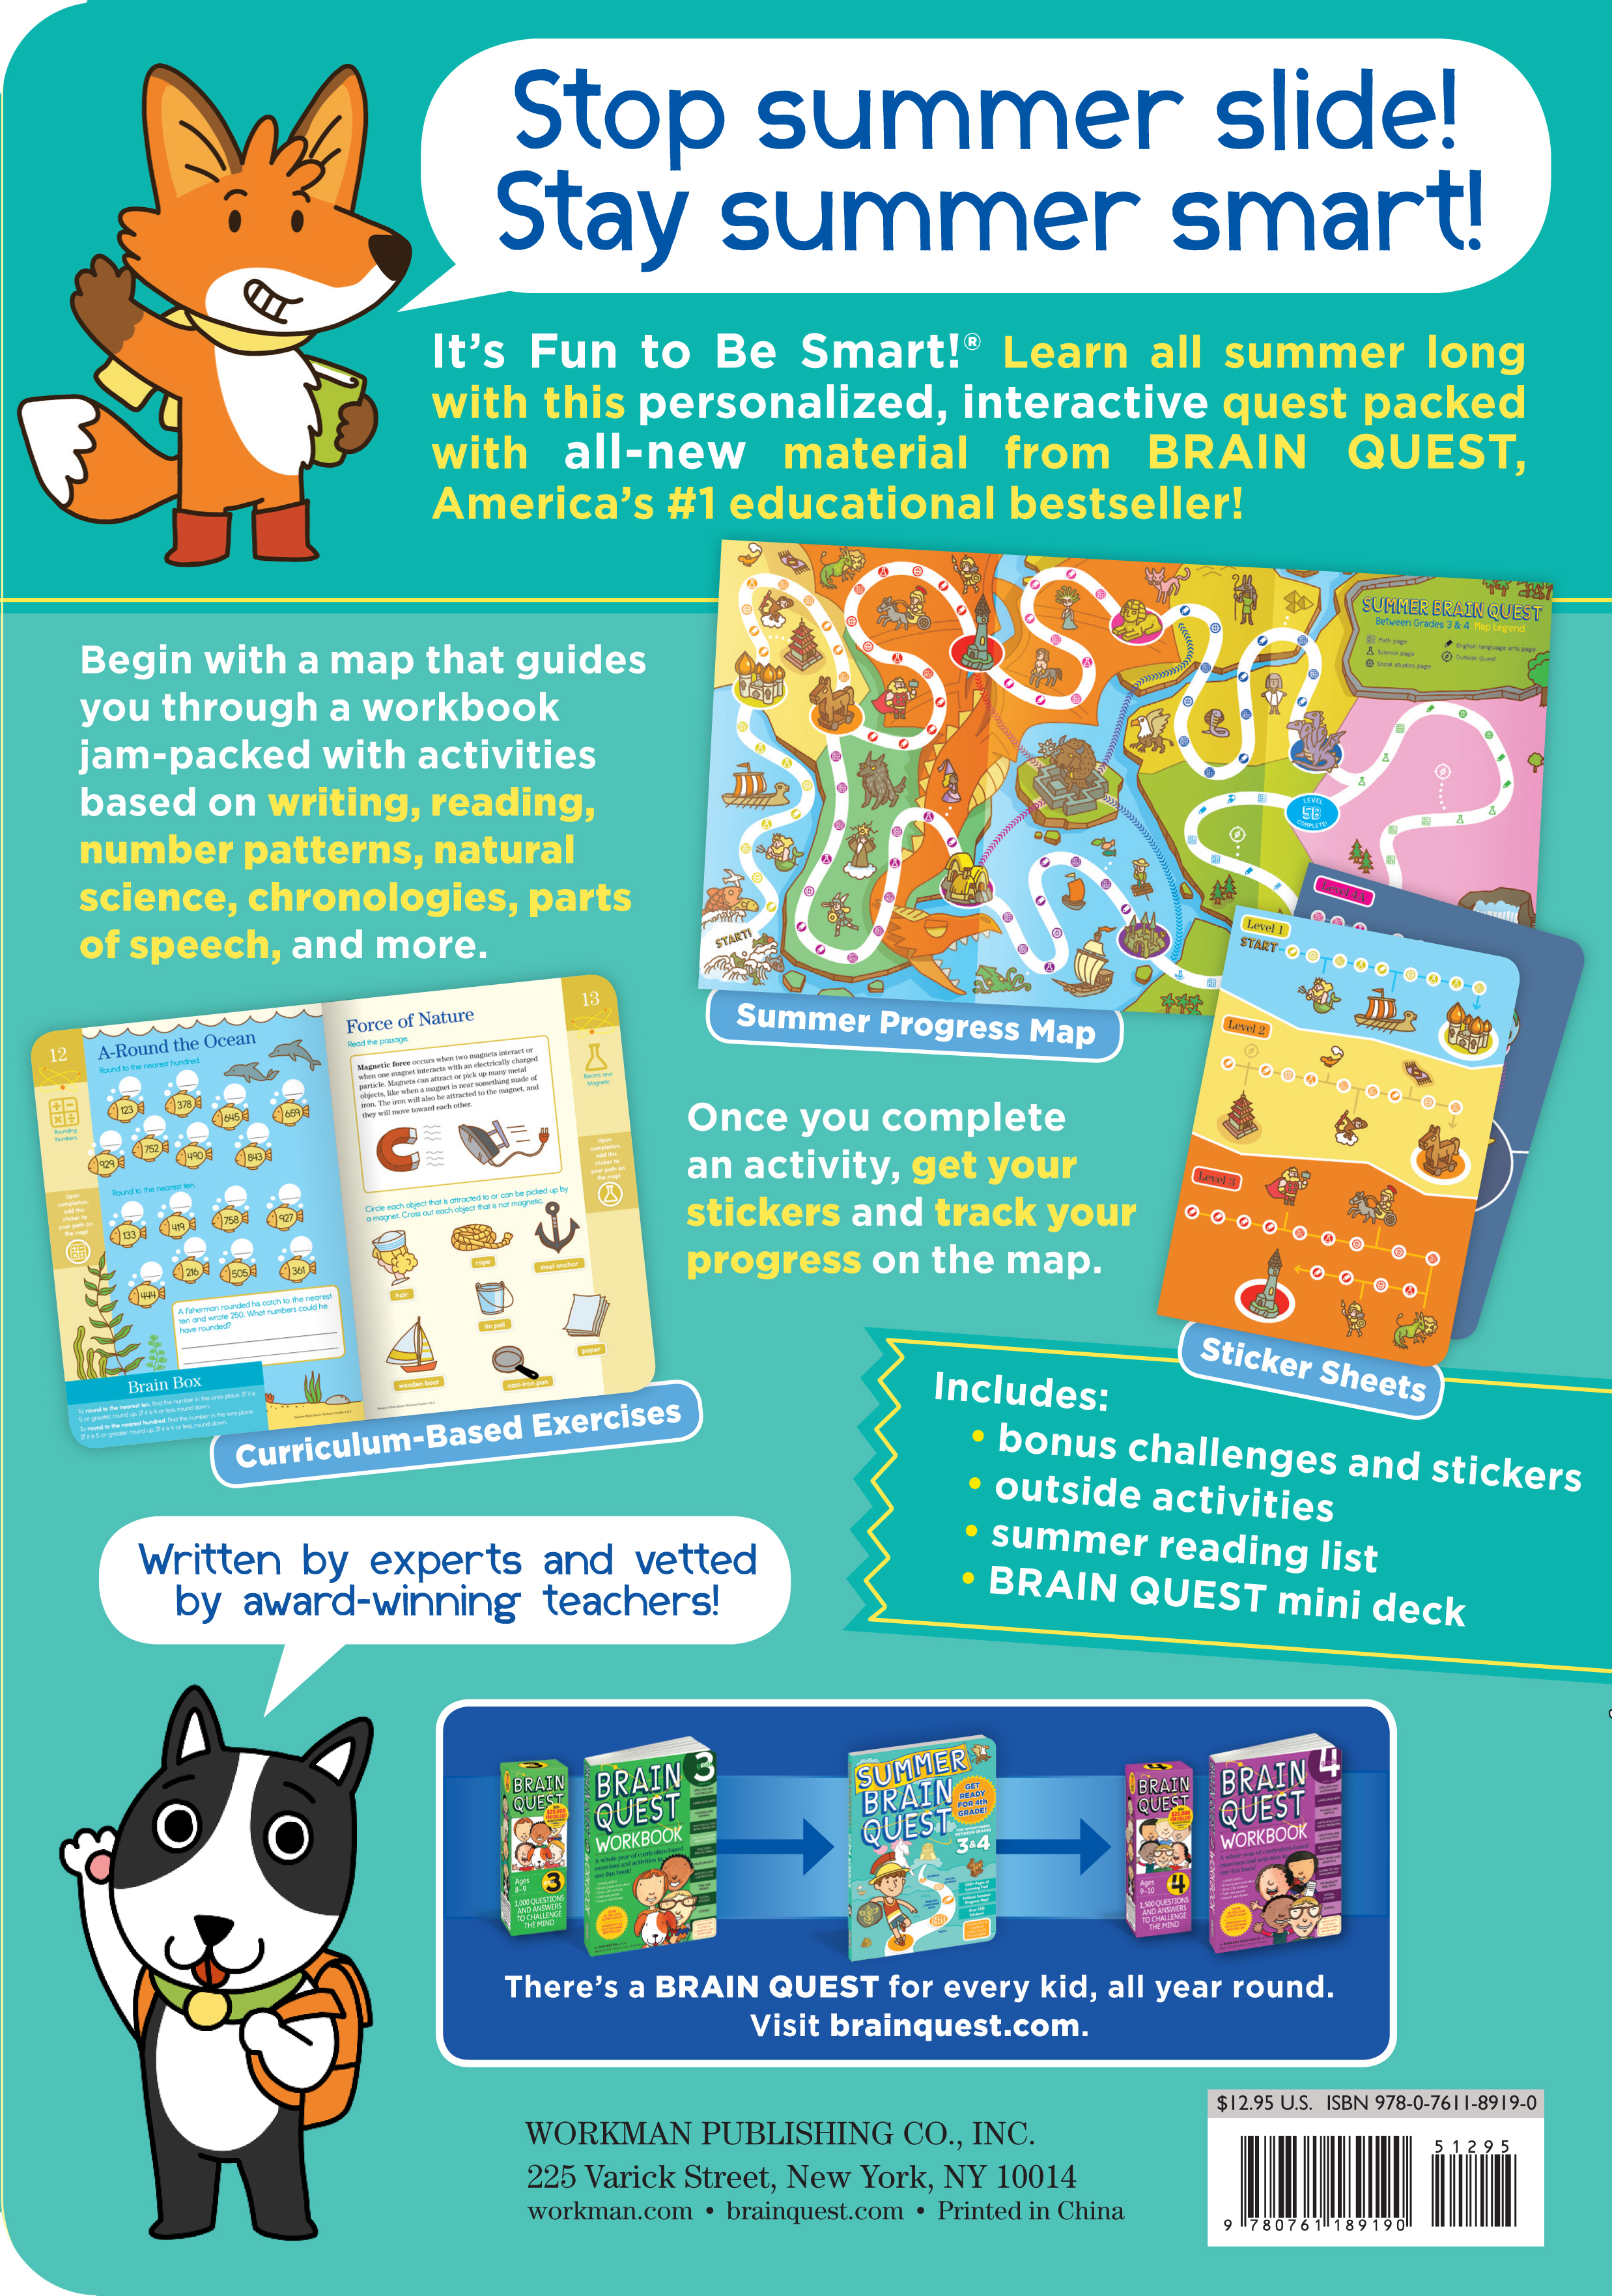 Summer Brain Quest: Between Grades 3 \u0026 4 - Workman Publishing [ 3525 x 2475 Pixel ]